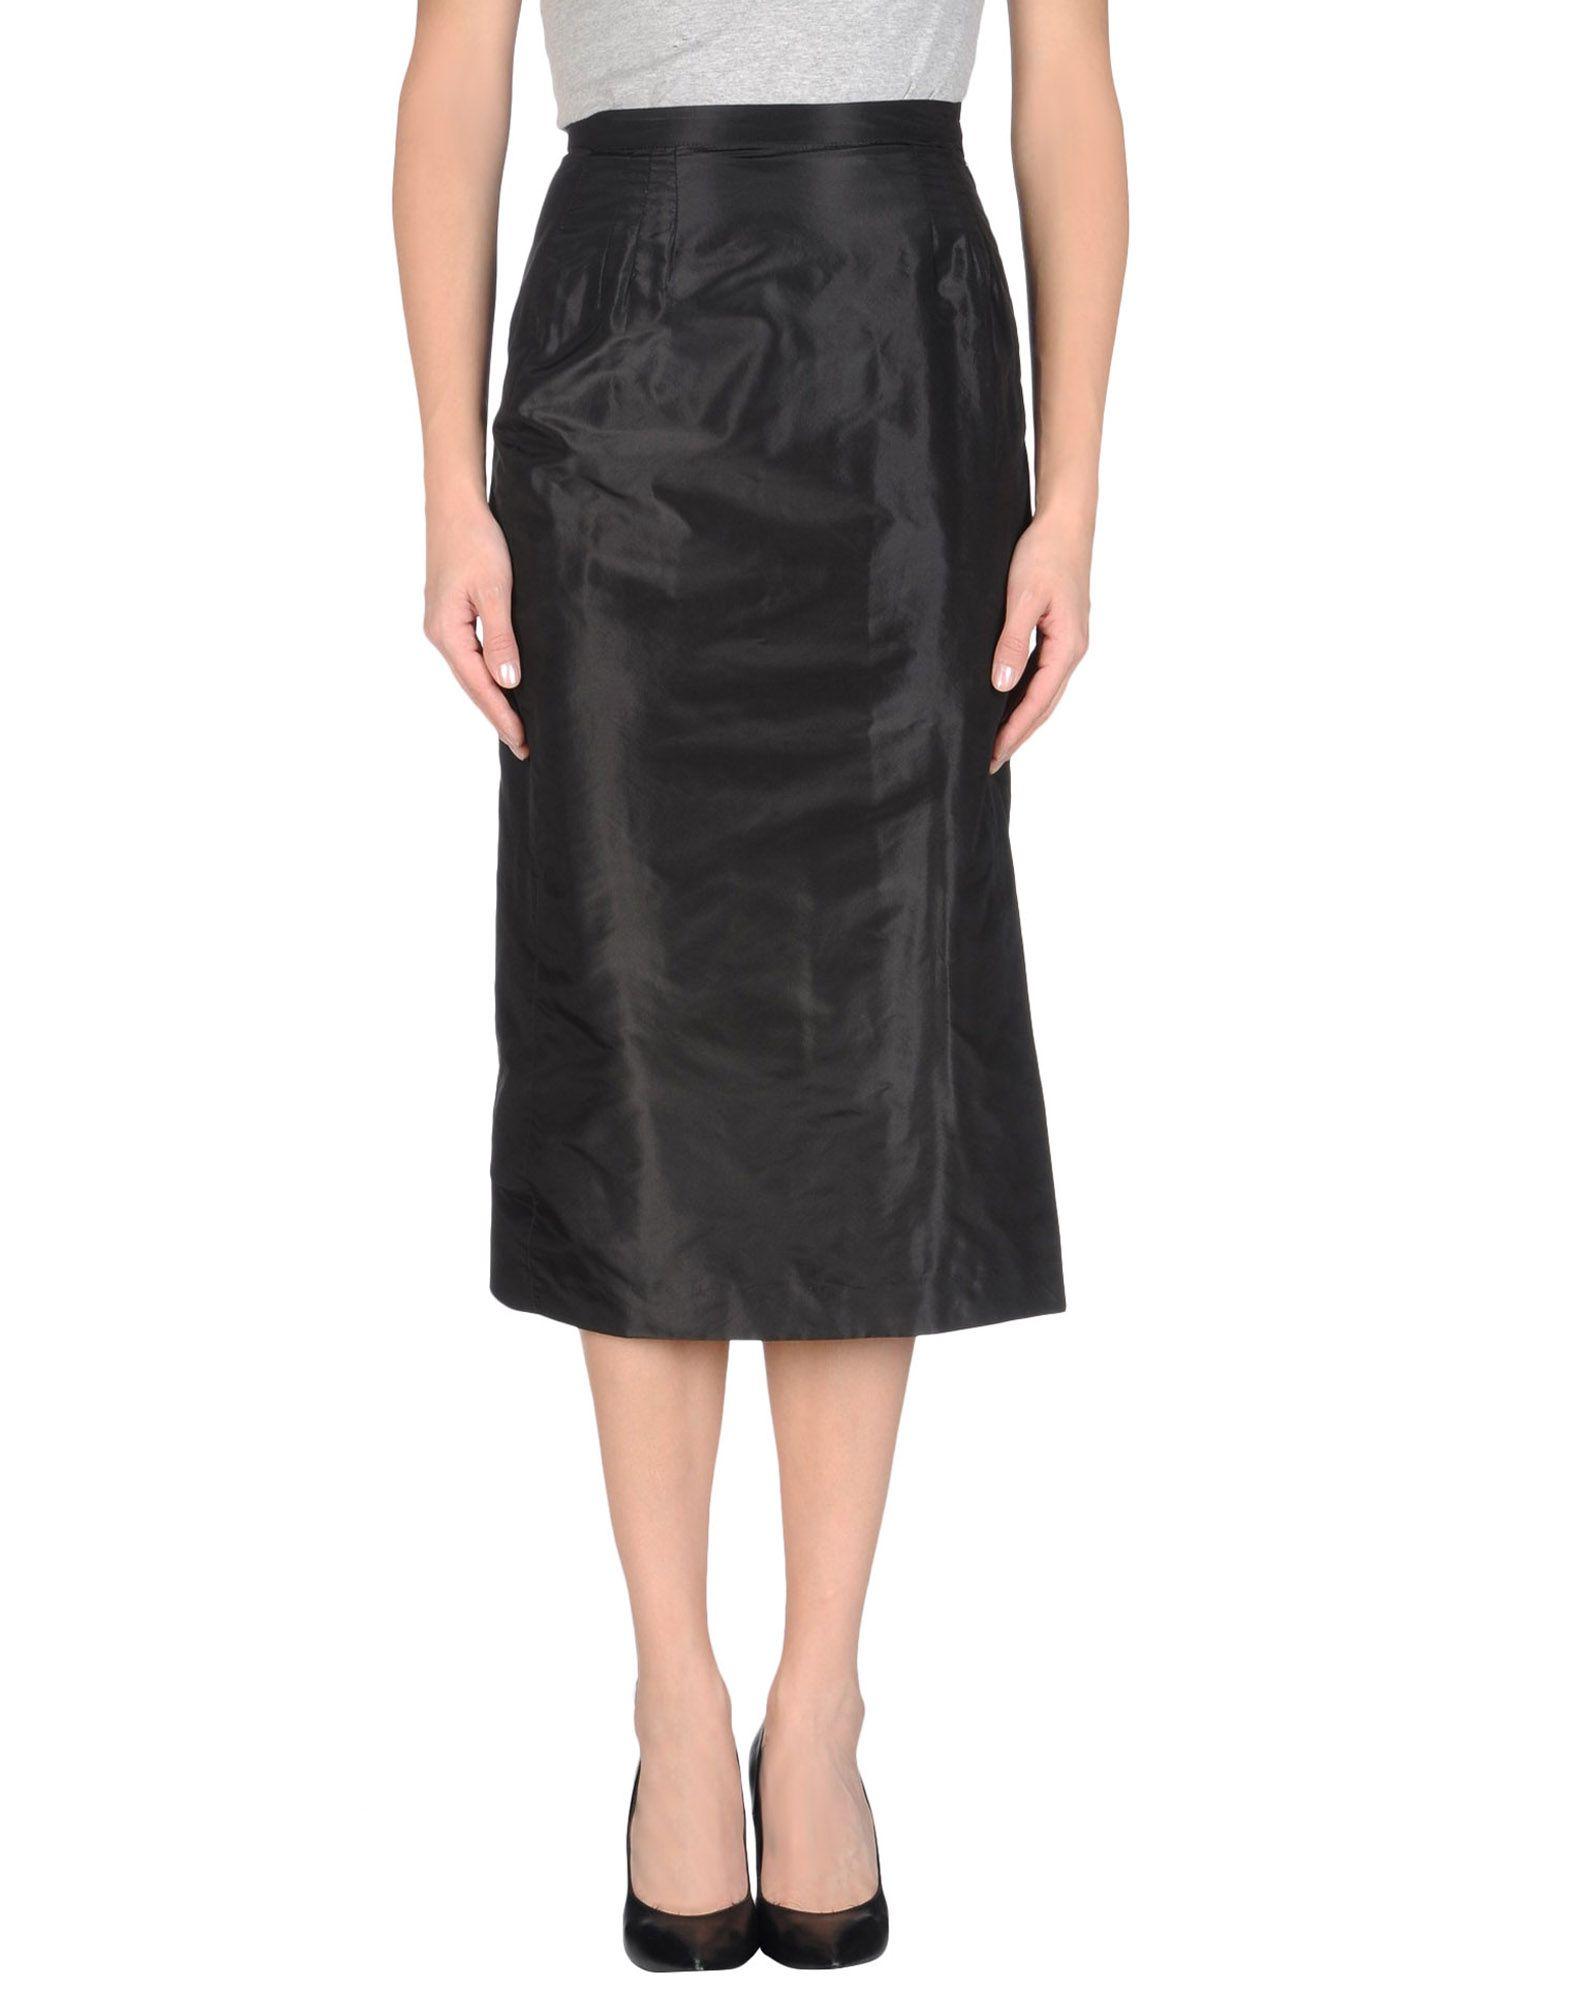 Maurizio pecoraro mid length skirt in black lyst for Maurizio pecoraro shop on line